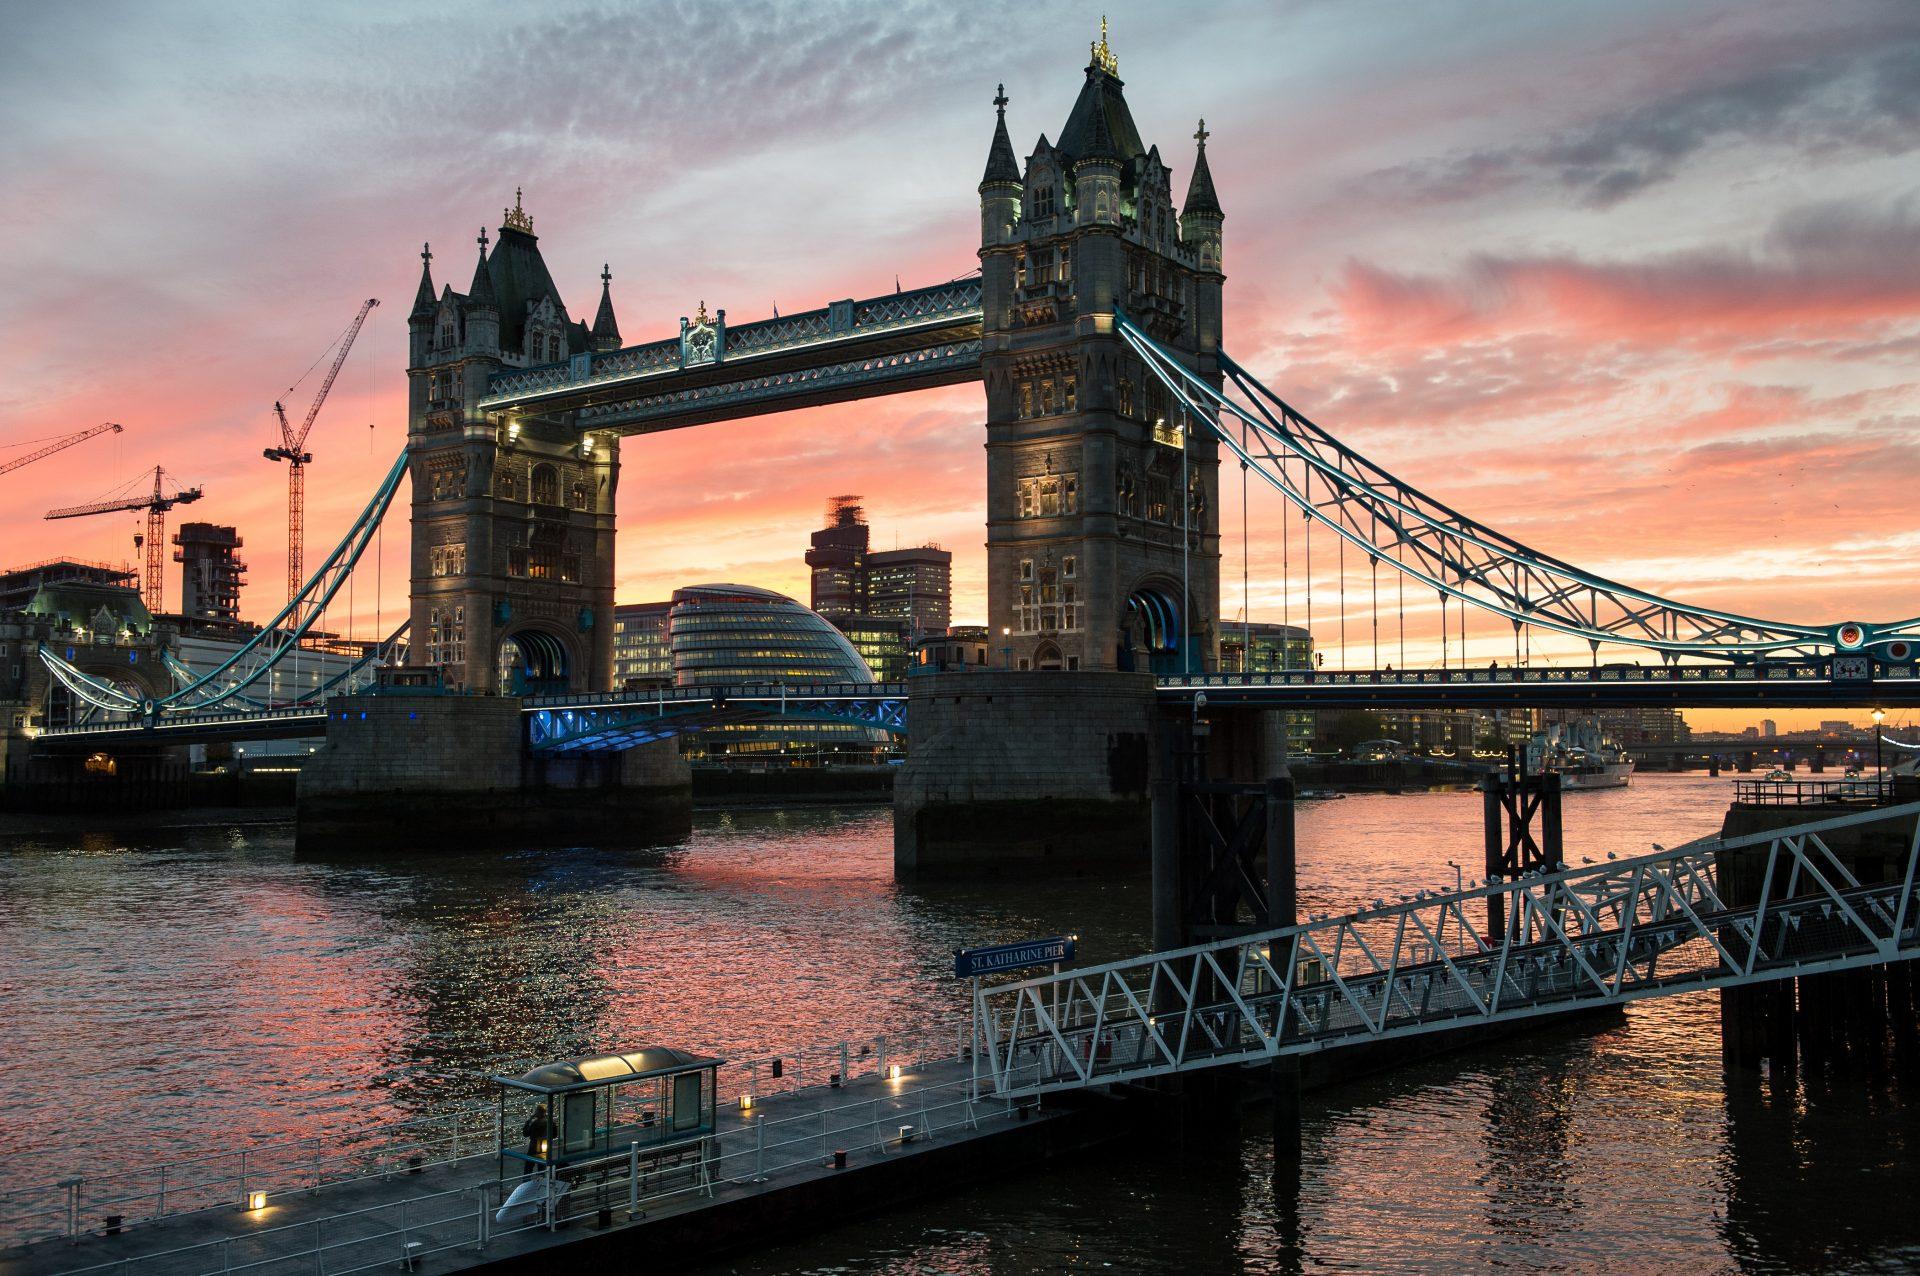 Photograph of Tower Bridge at sunset